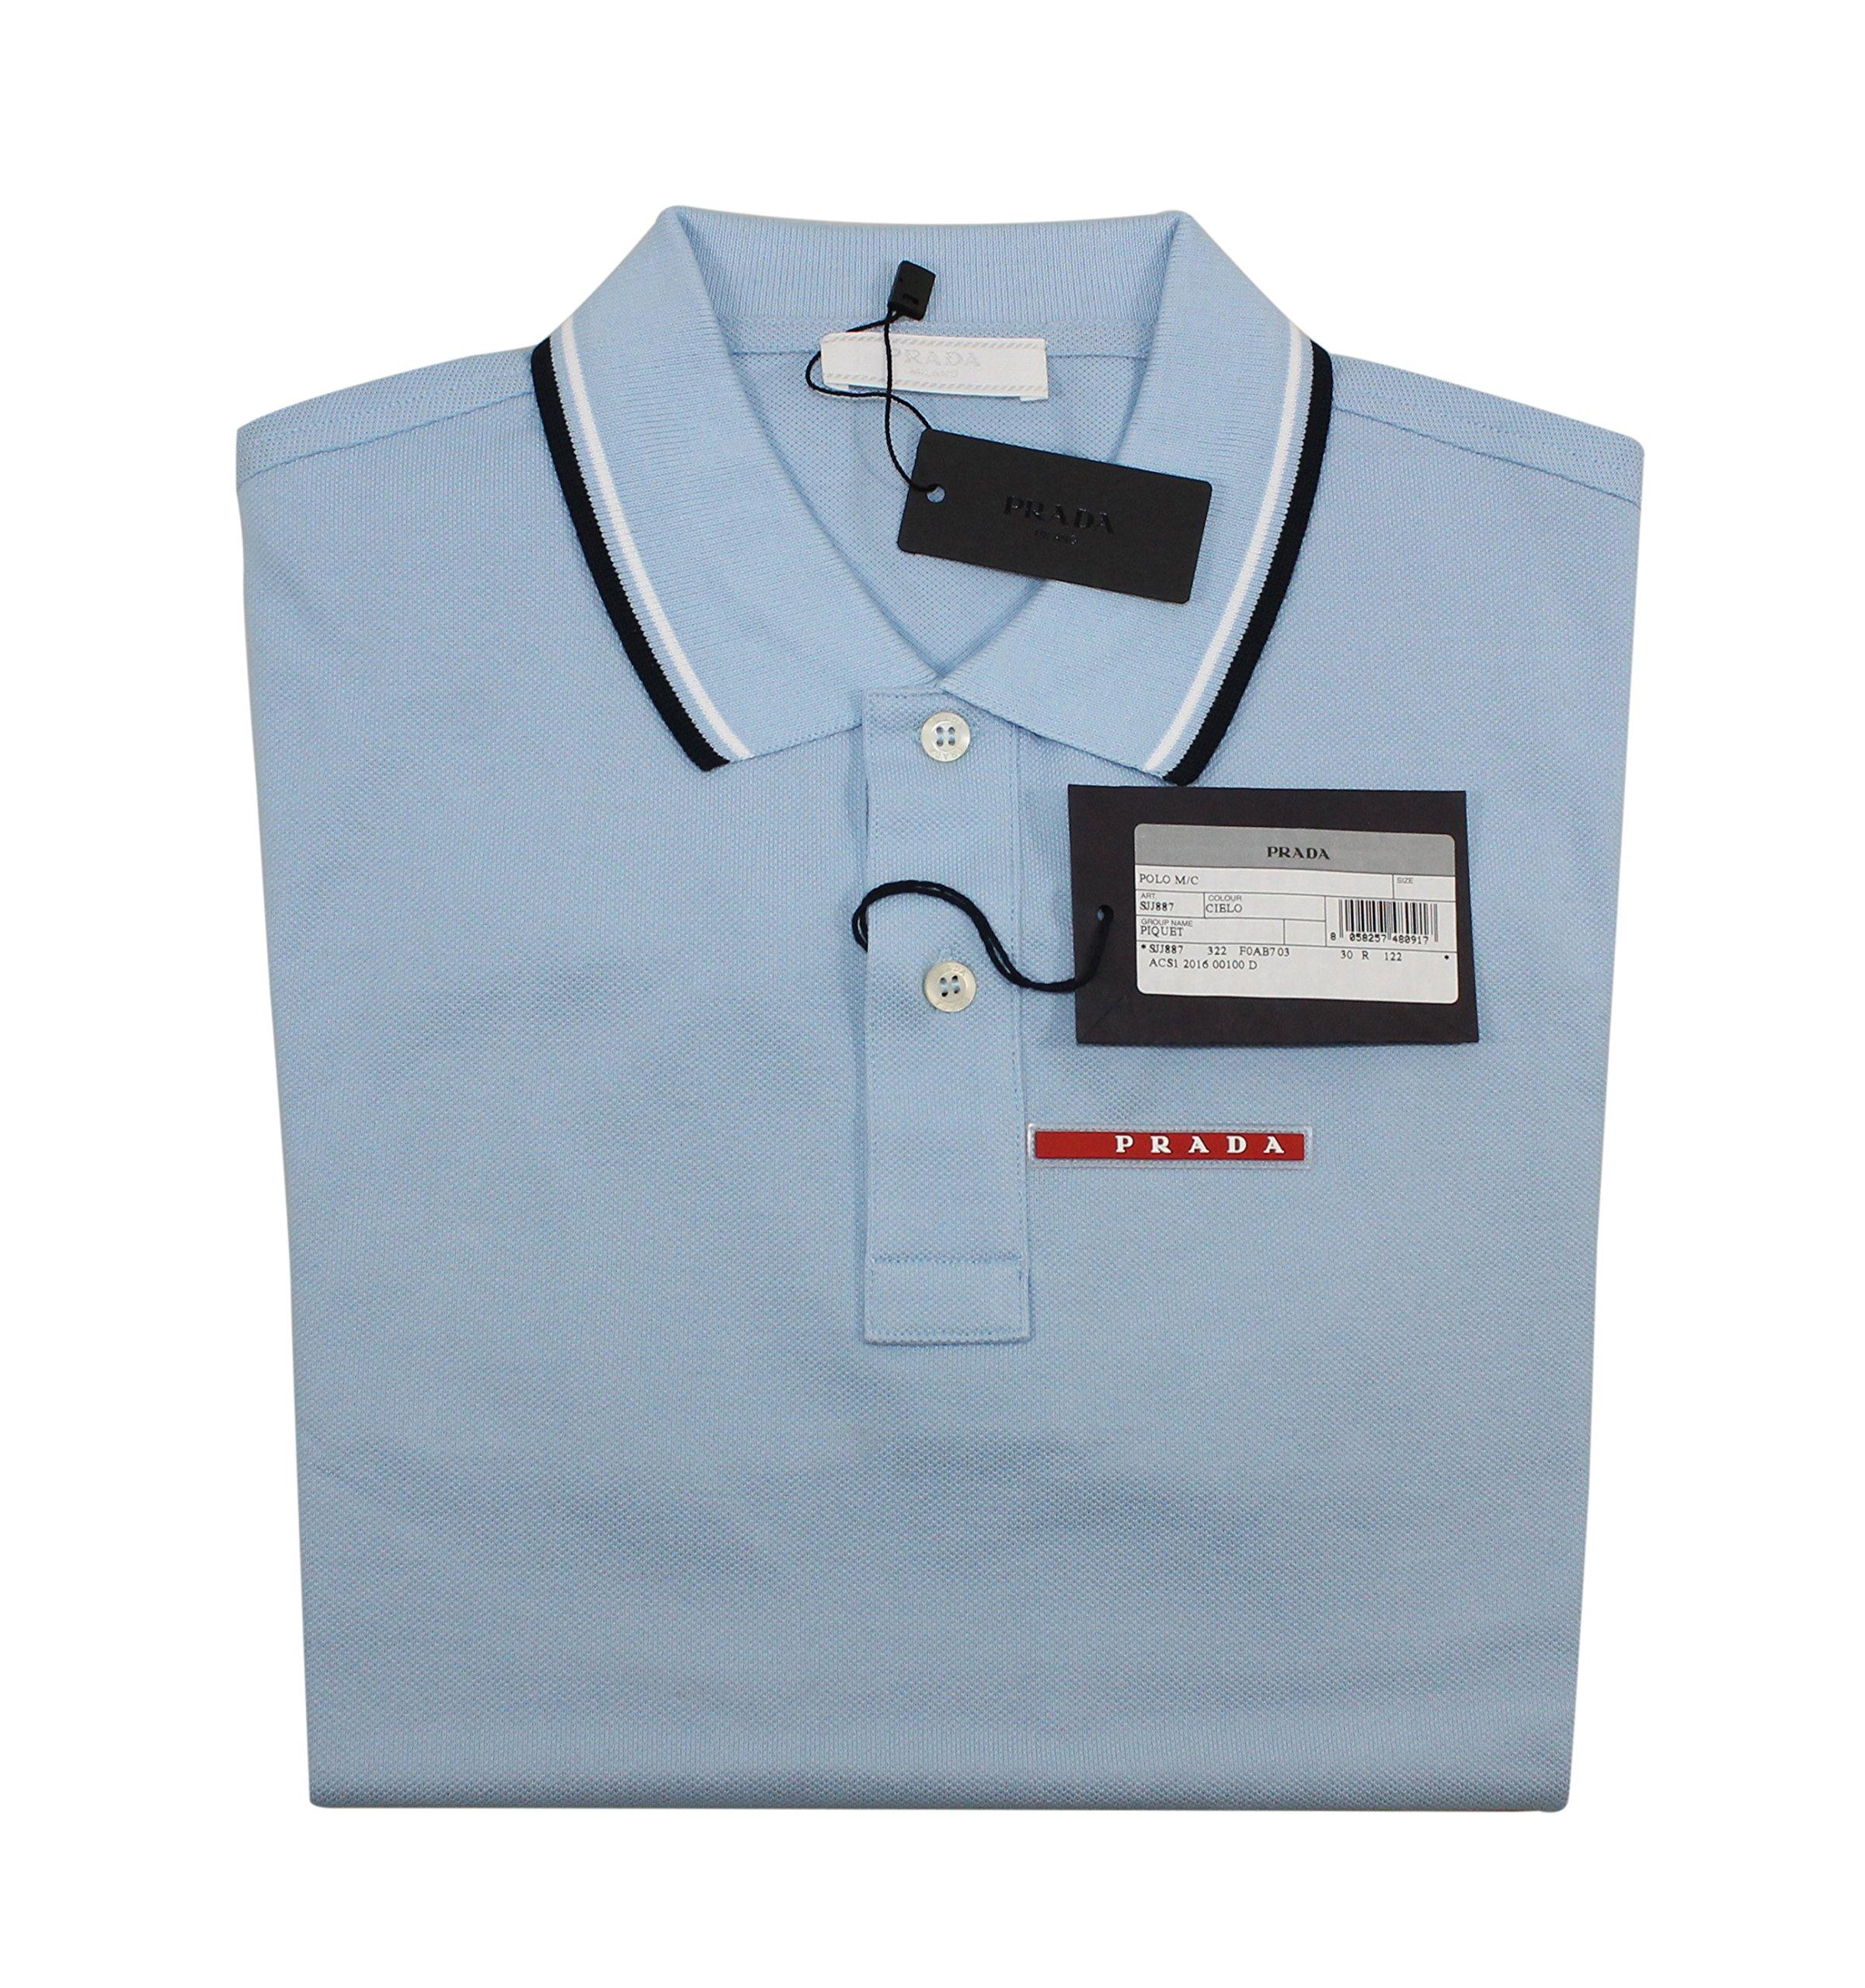 Prada Men's Cotton Piqué Short Sleeve Slim Fit Polo Shirt, Sky-Blue (Cielo) (X-Large)